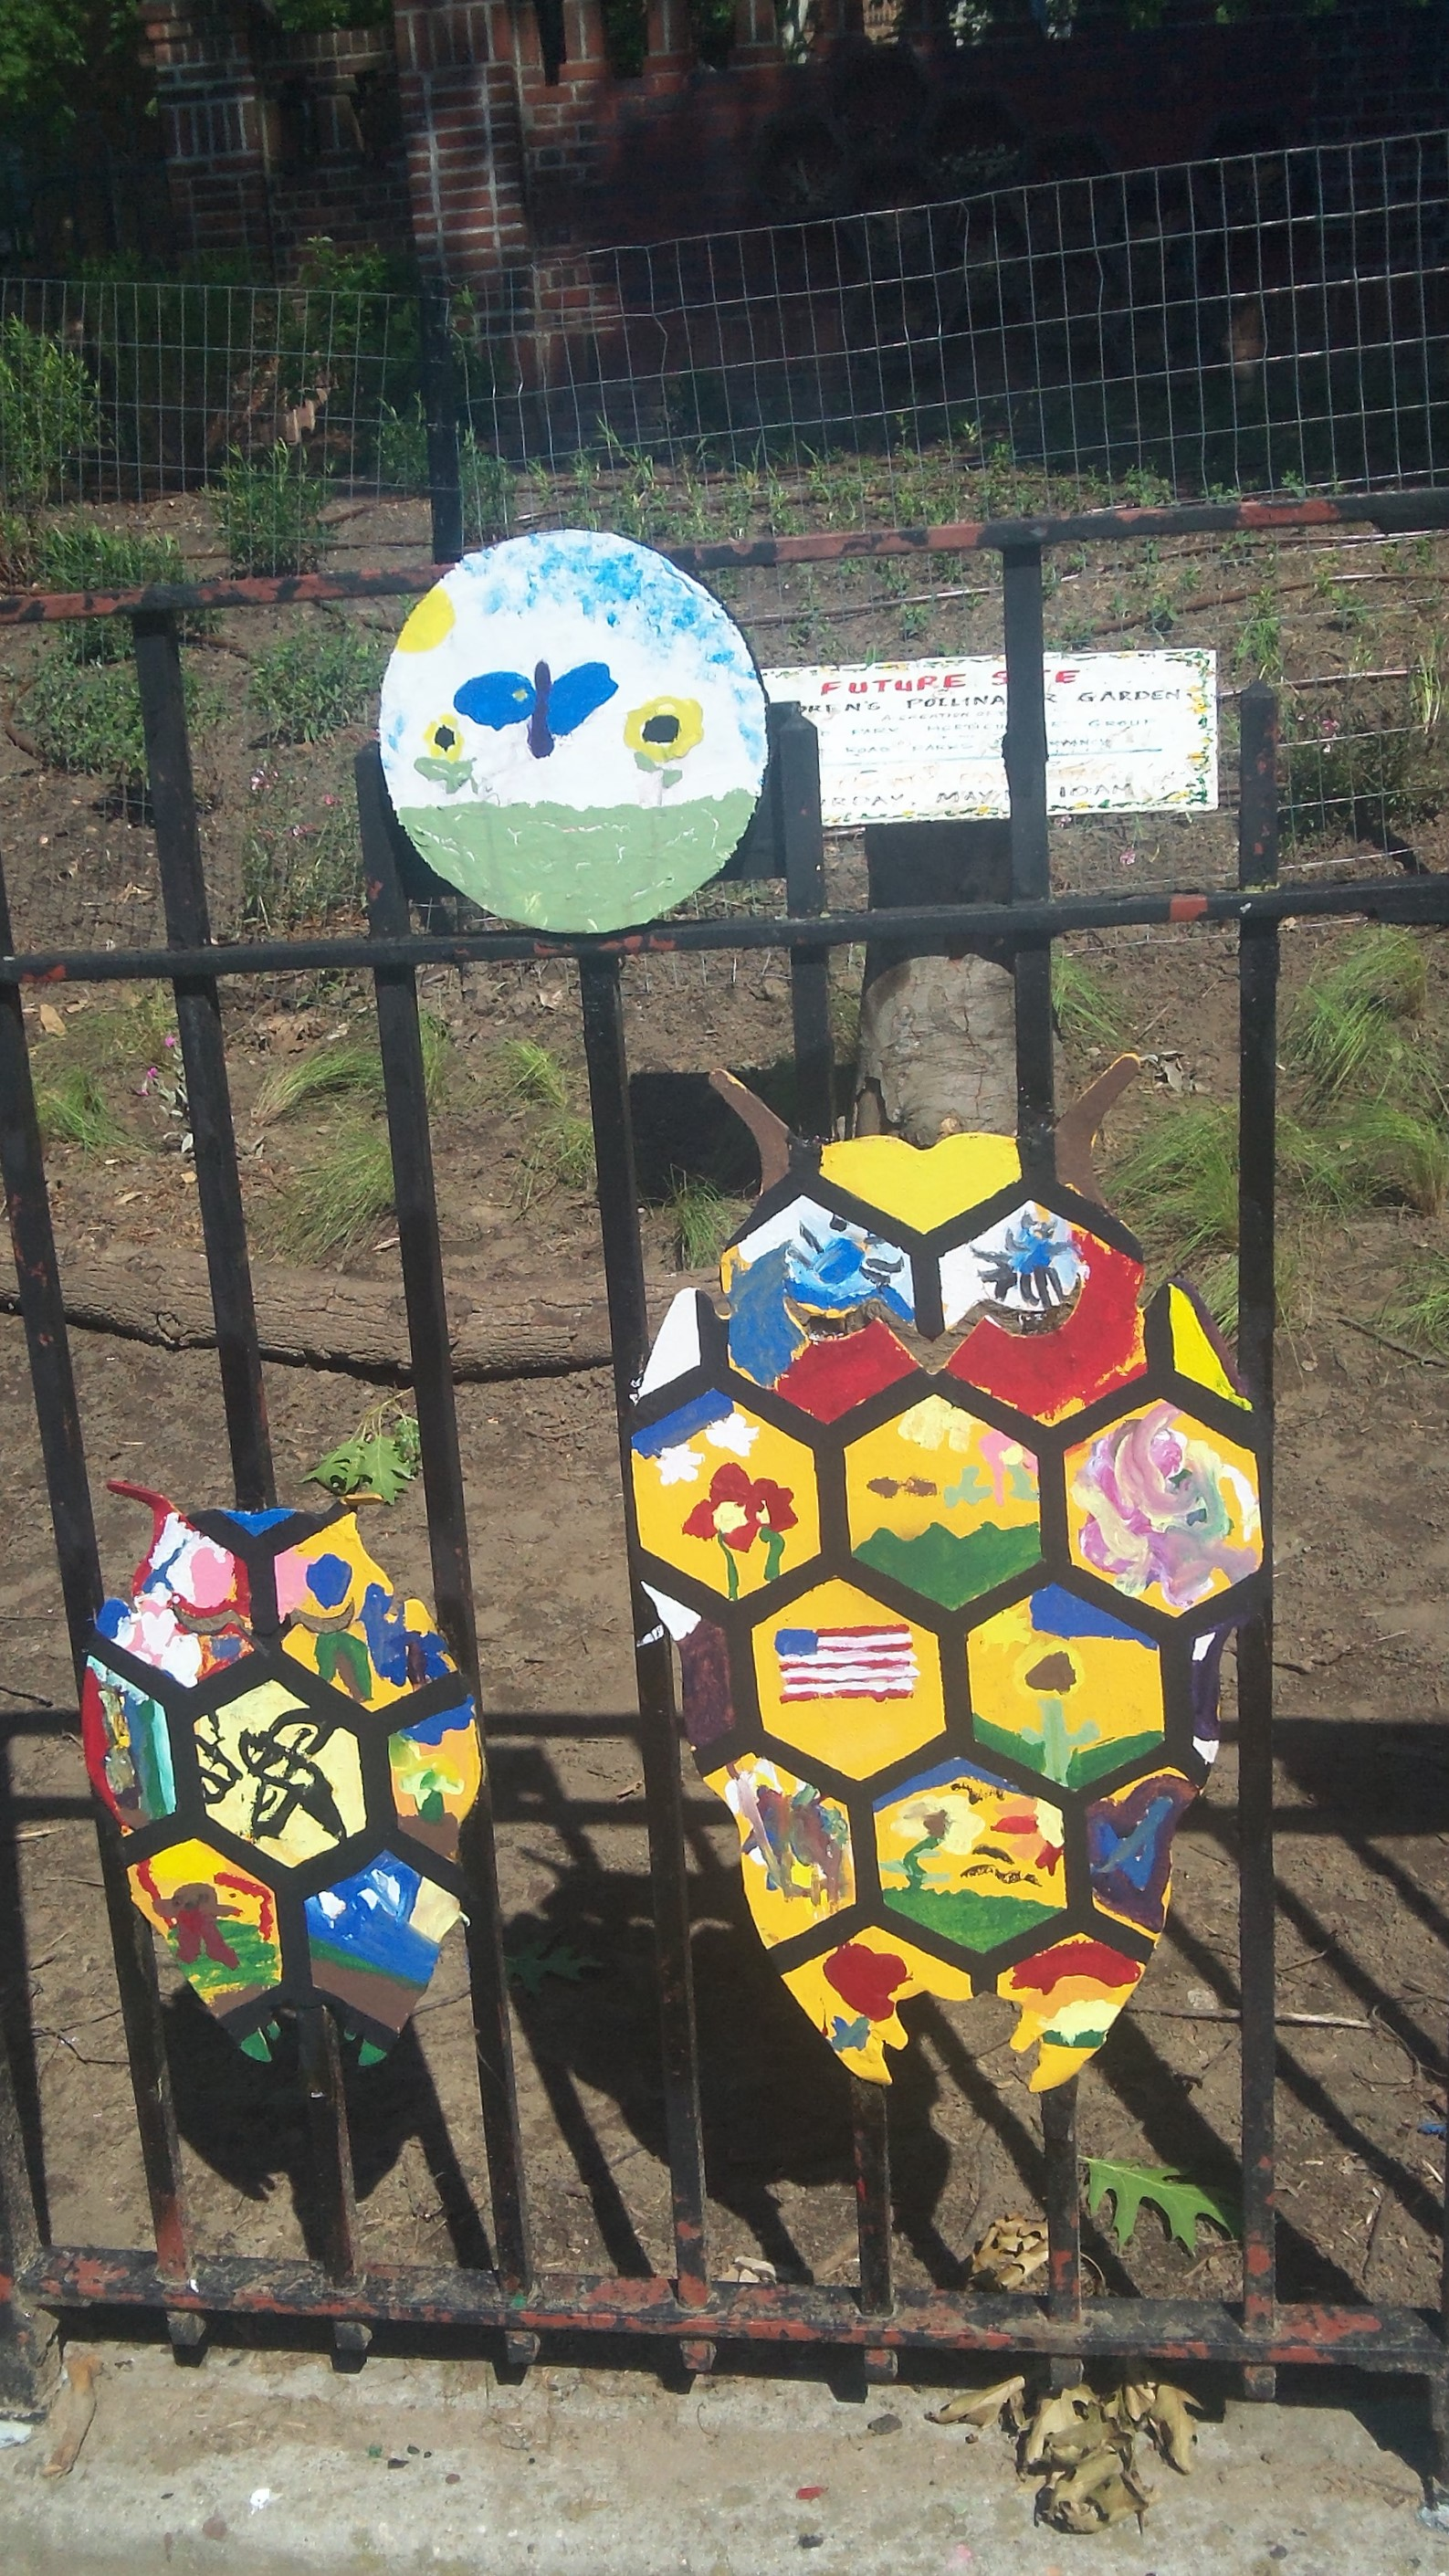 Childrens Workshop at Owl's Head Park